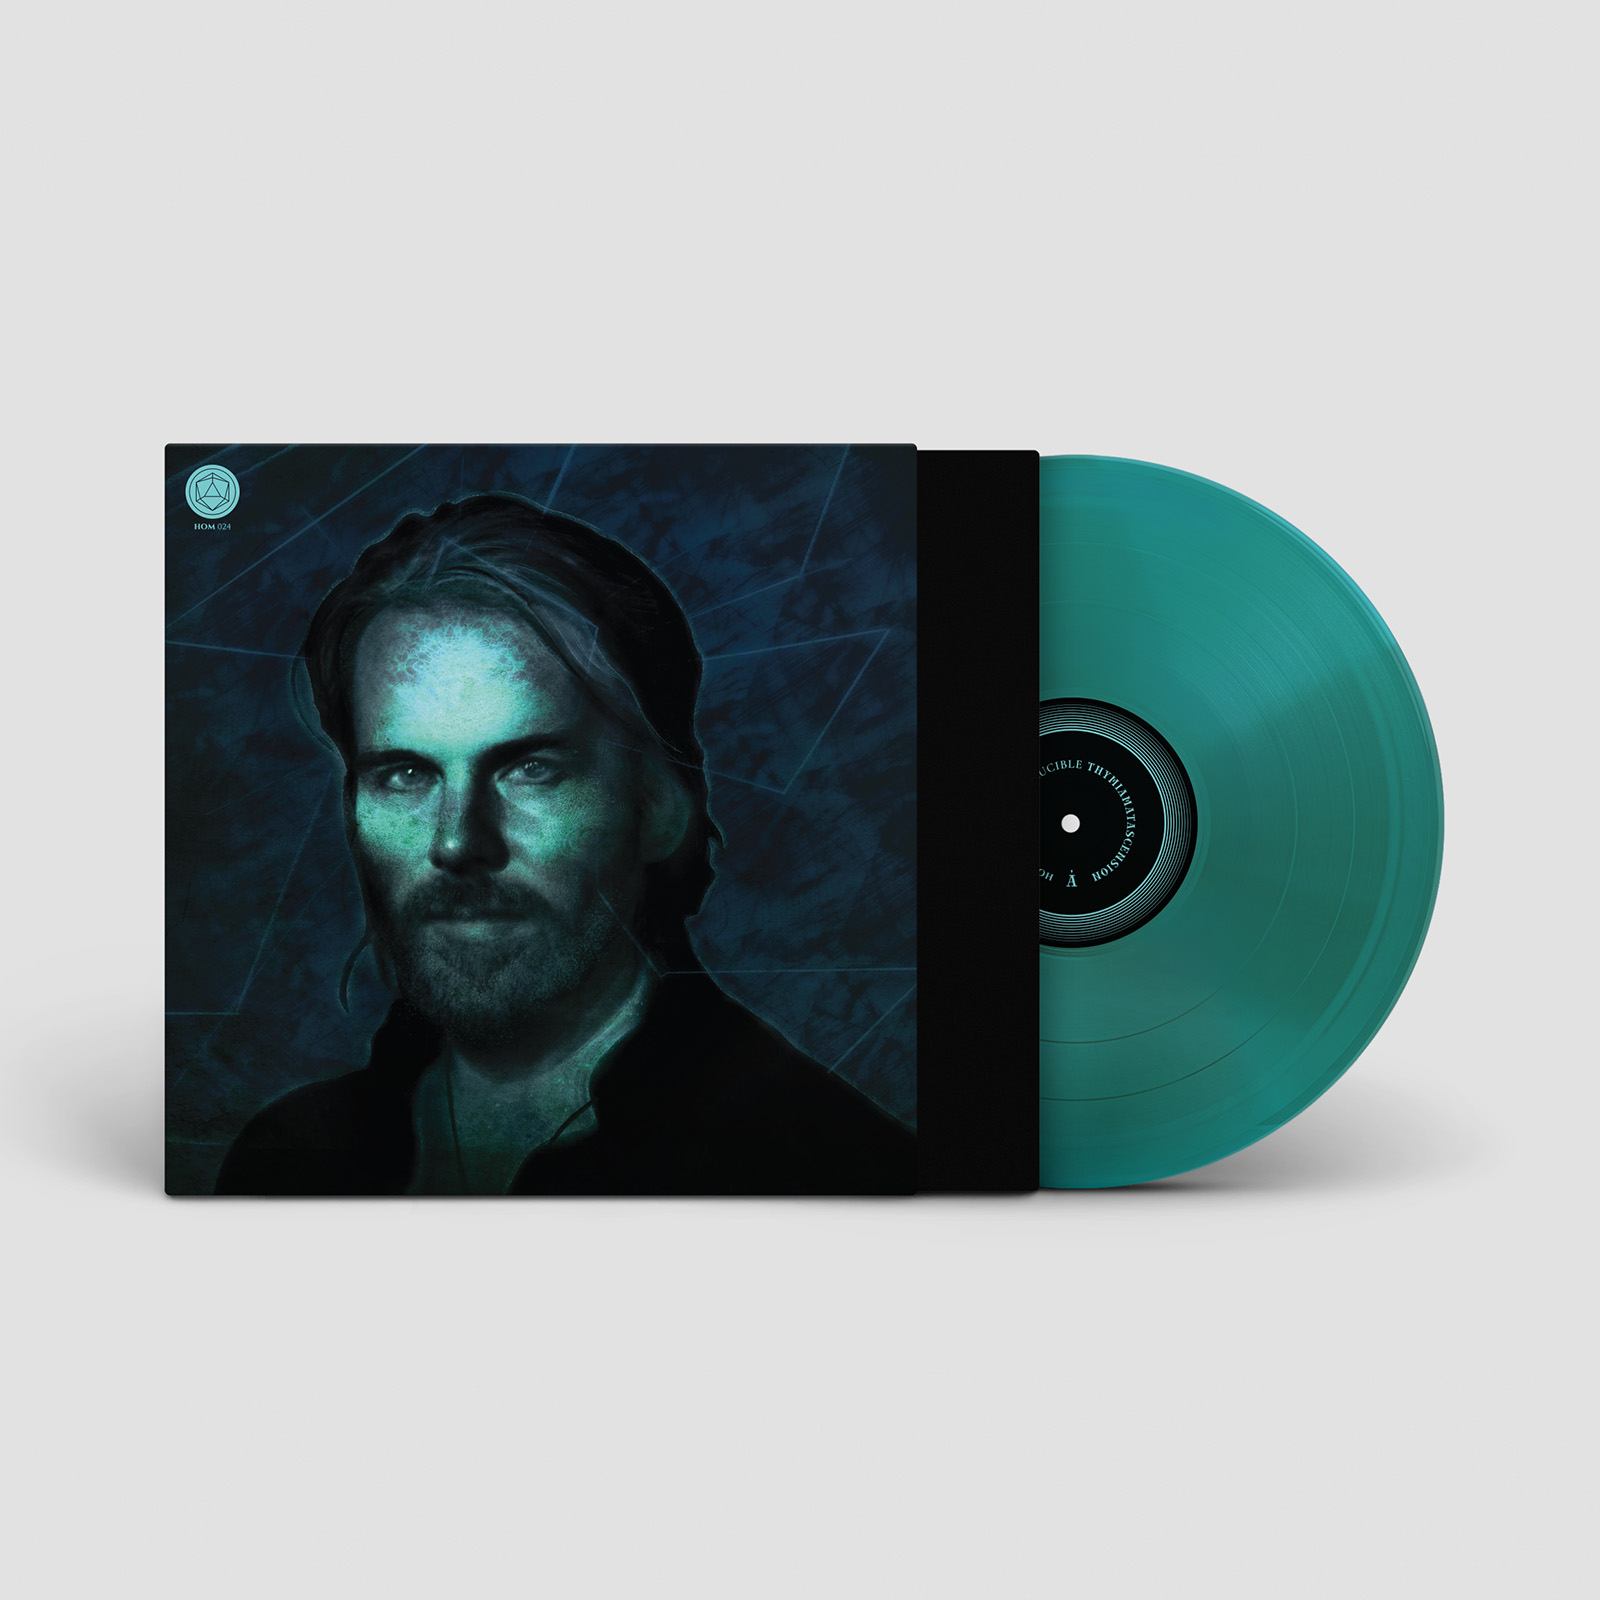 Buy Online Alora Crucible - Thymiamatascension LP